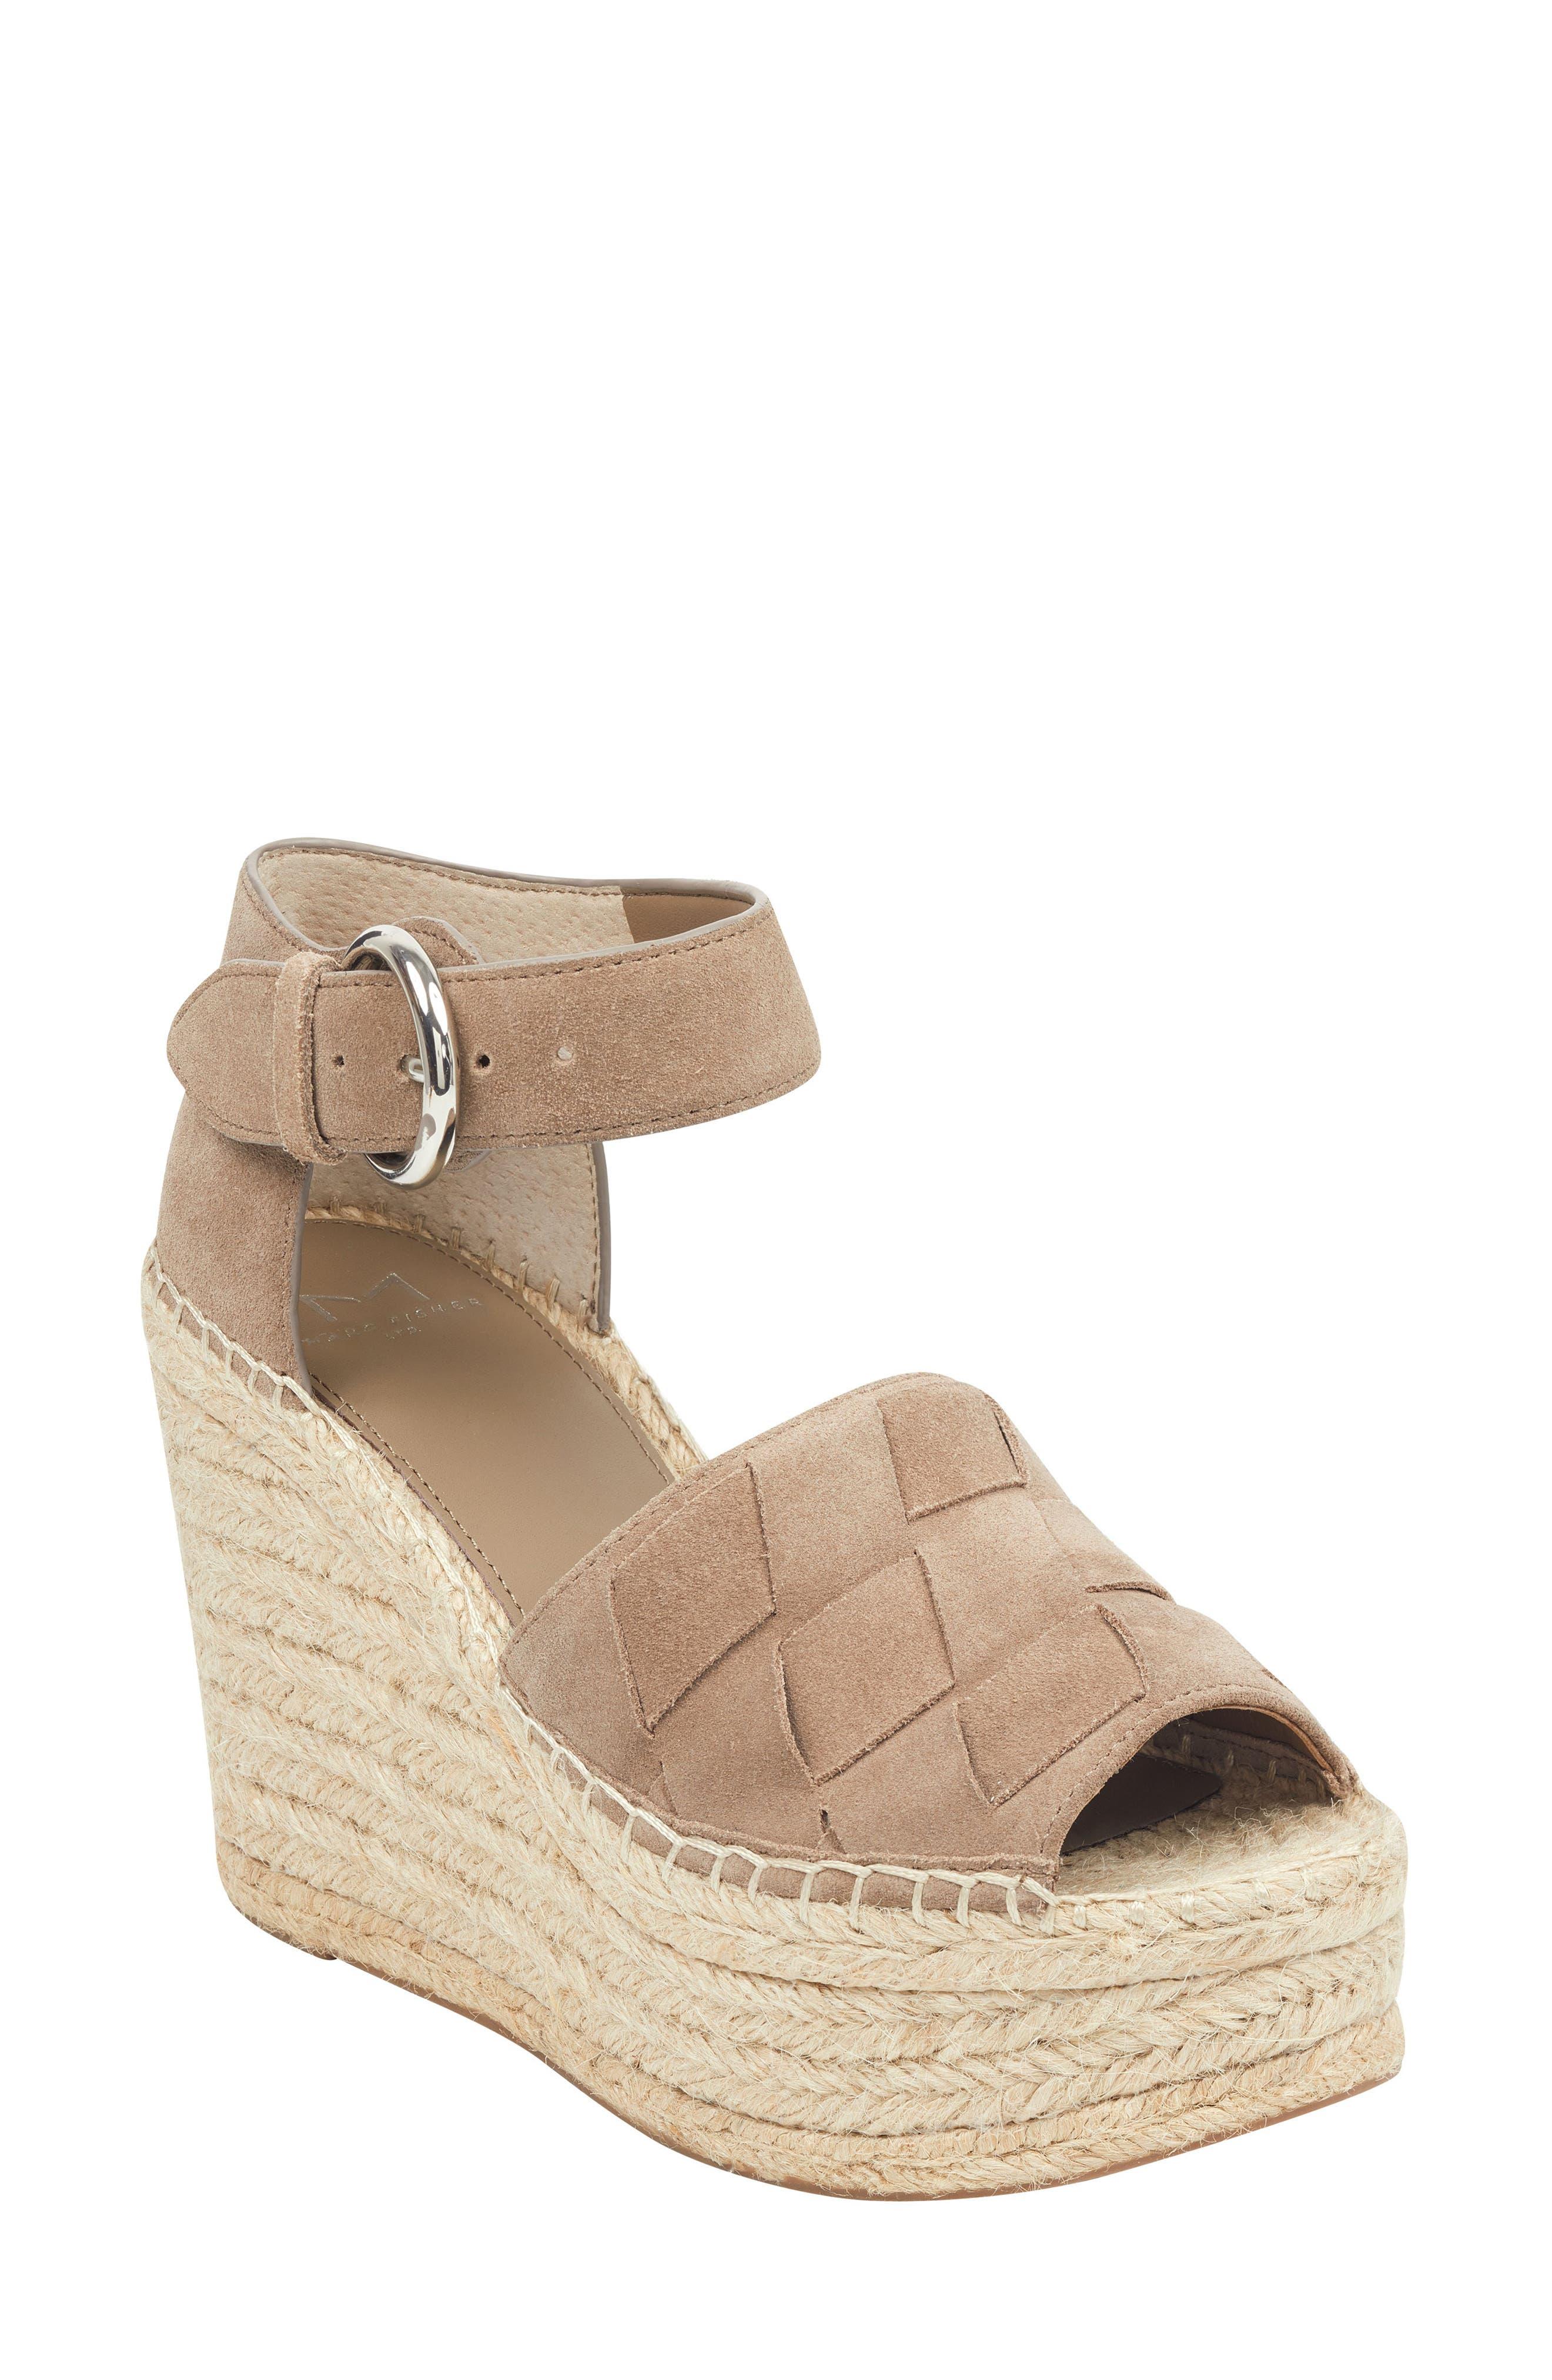 Adalla Platform Wedge Sandal, Main, color, 250